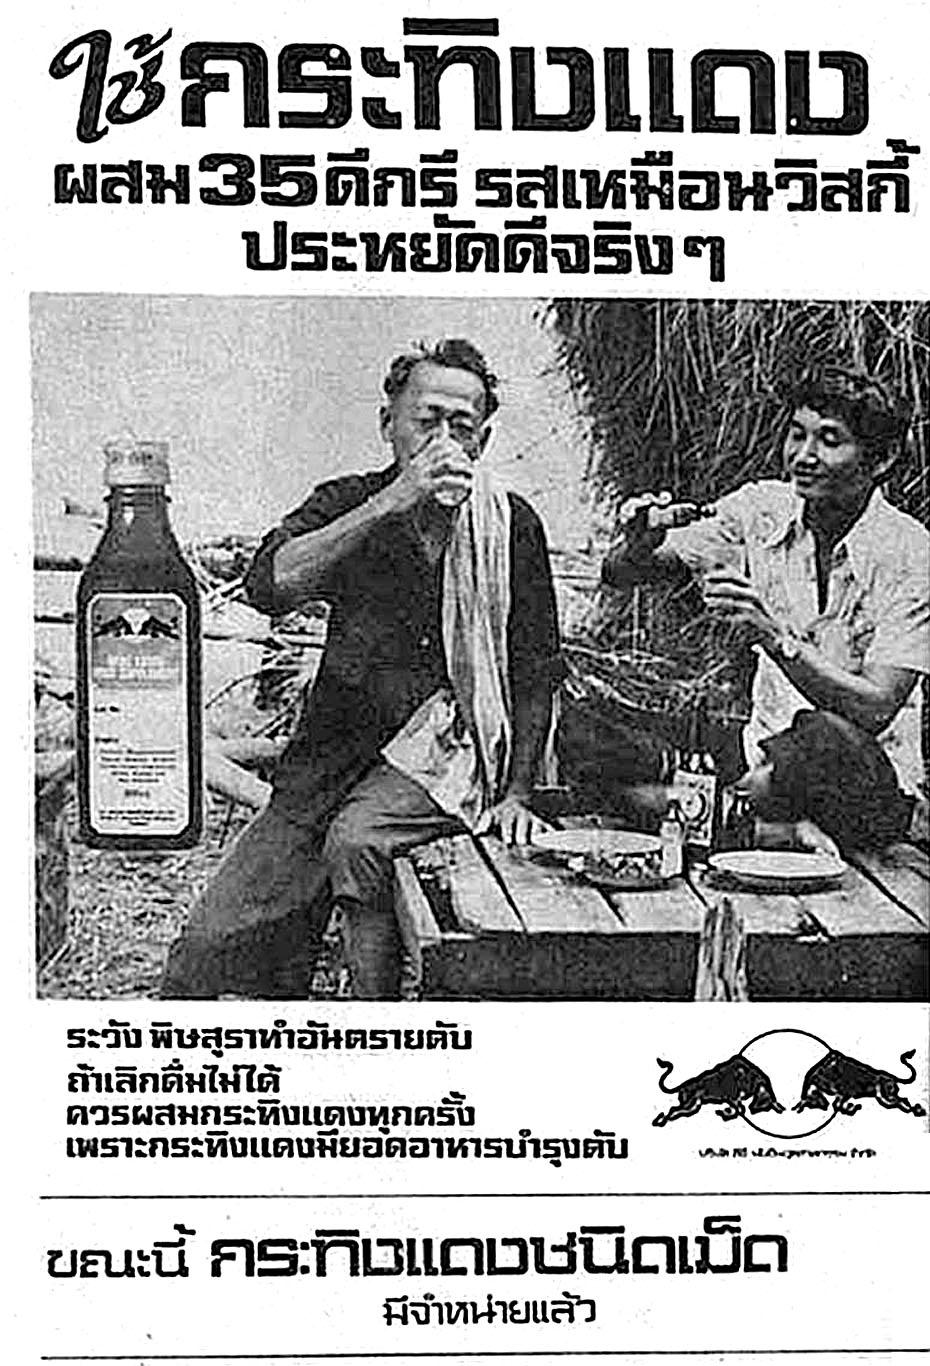 1978 Advert.jpg